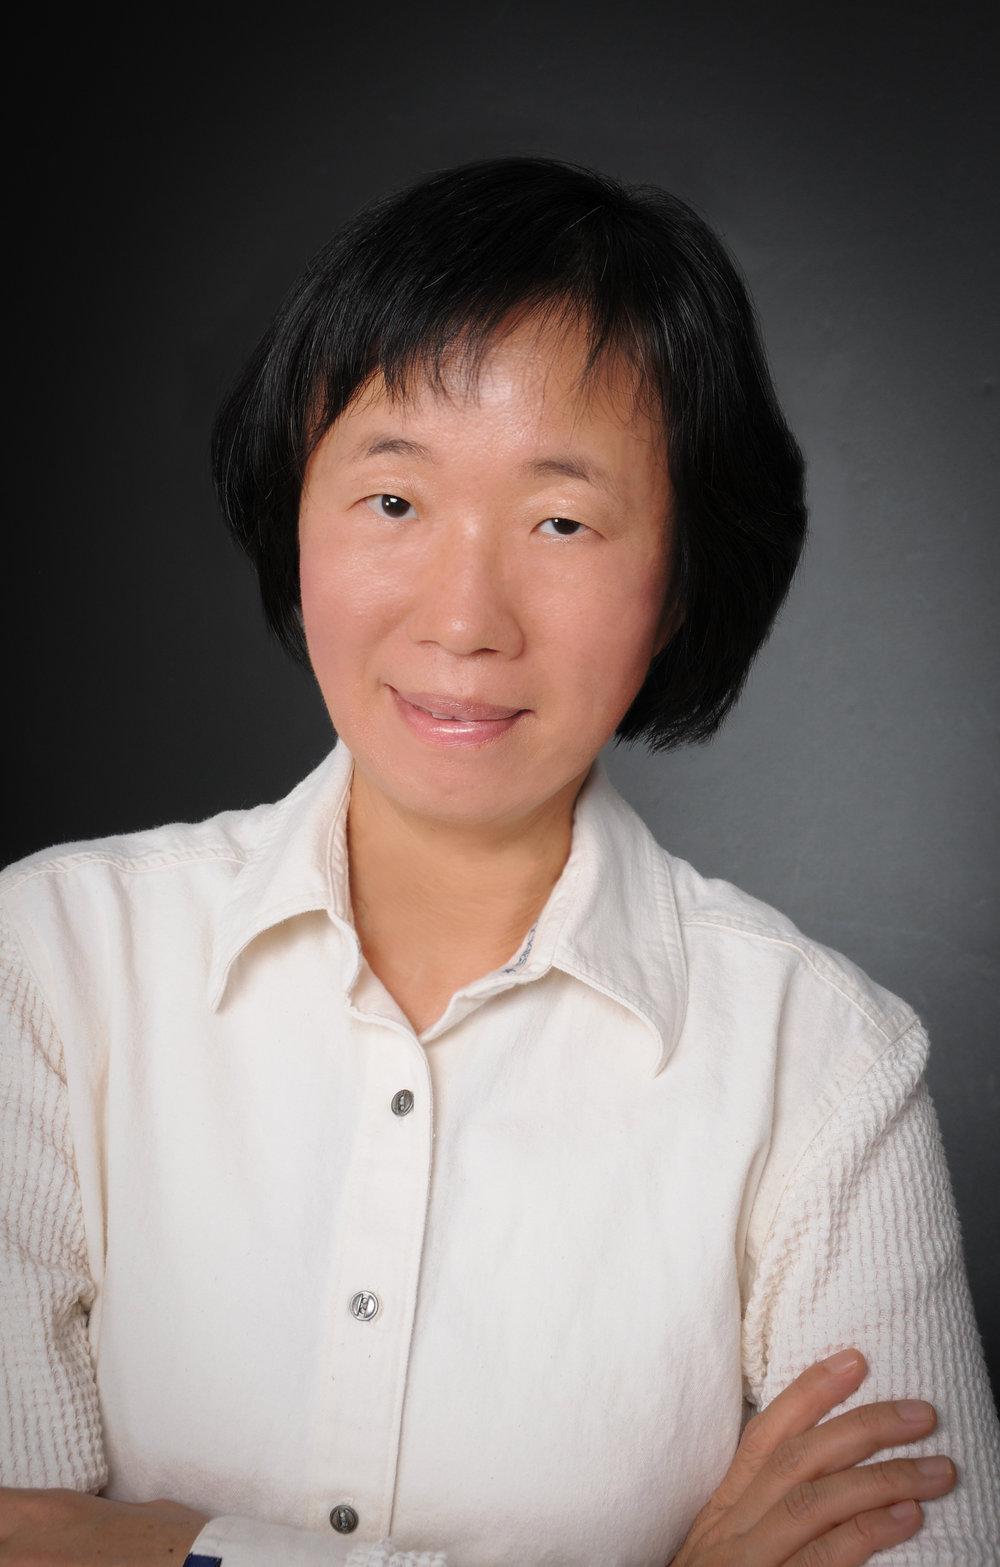 Headshot - Shiang Chen-Williams.JPG